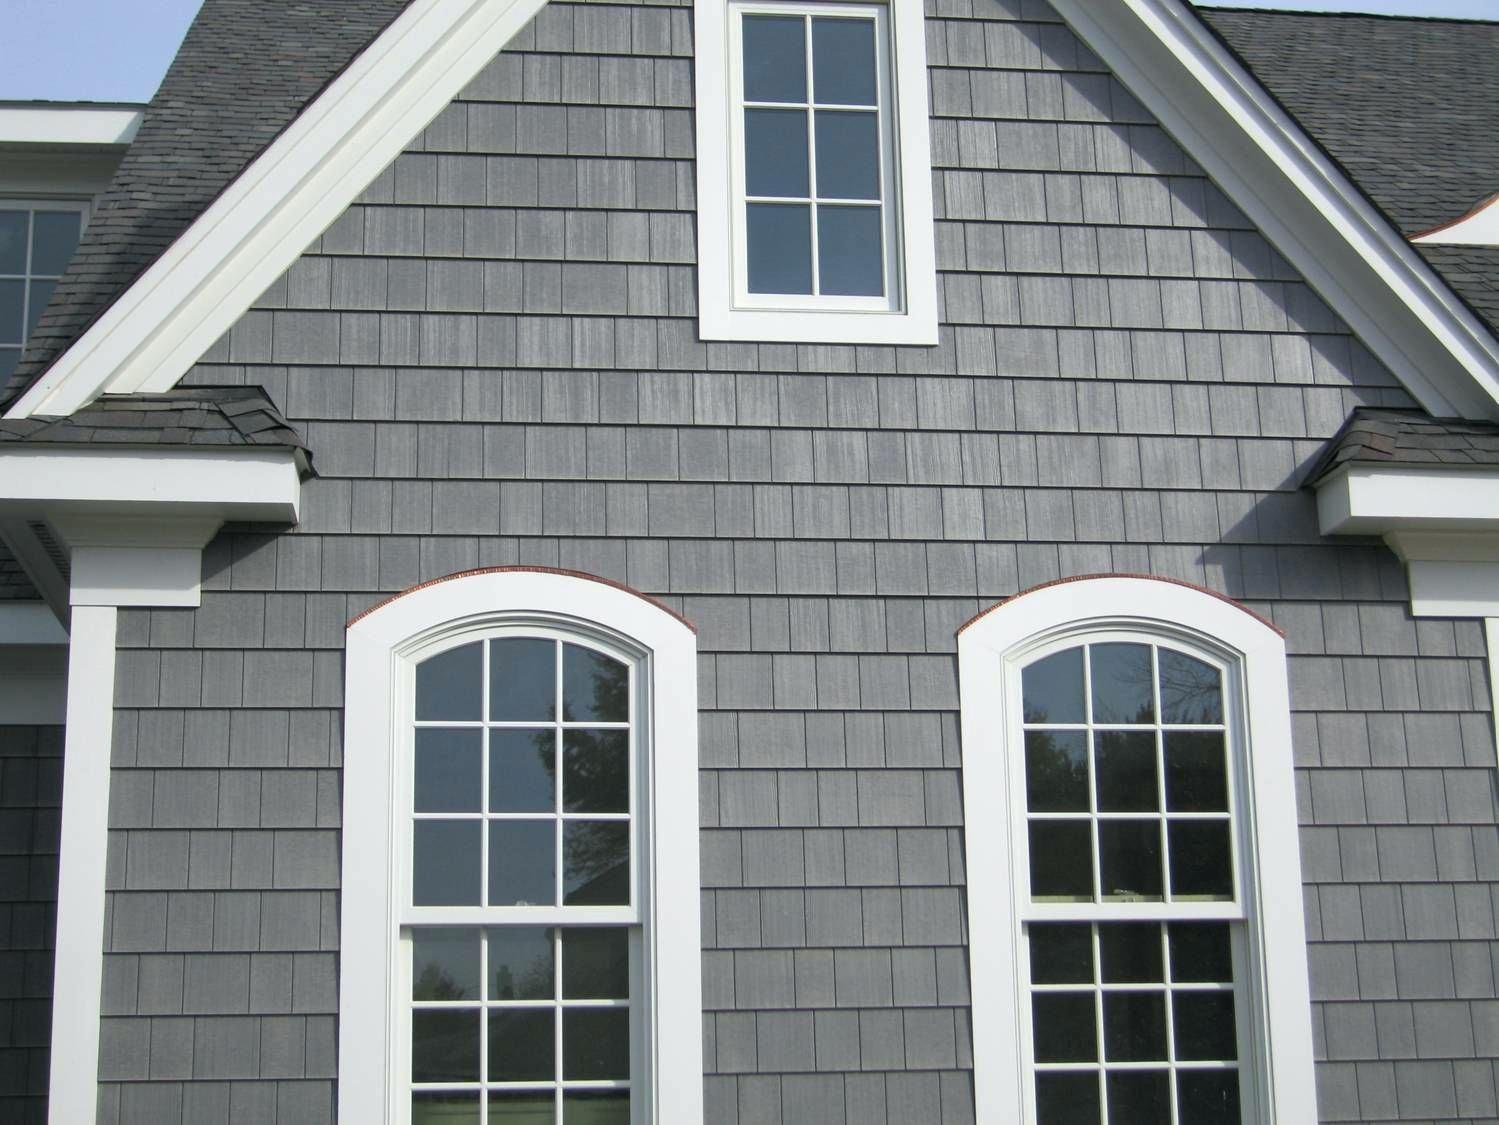 Vinyl Cedar Shakes Shake Siding Images Vs Cost Canada House Paint Exterior Exterior House Colors Grey Exterior House Colors